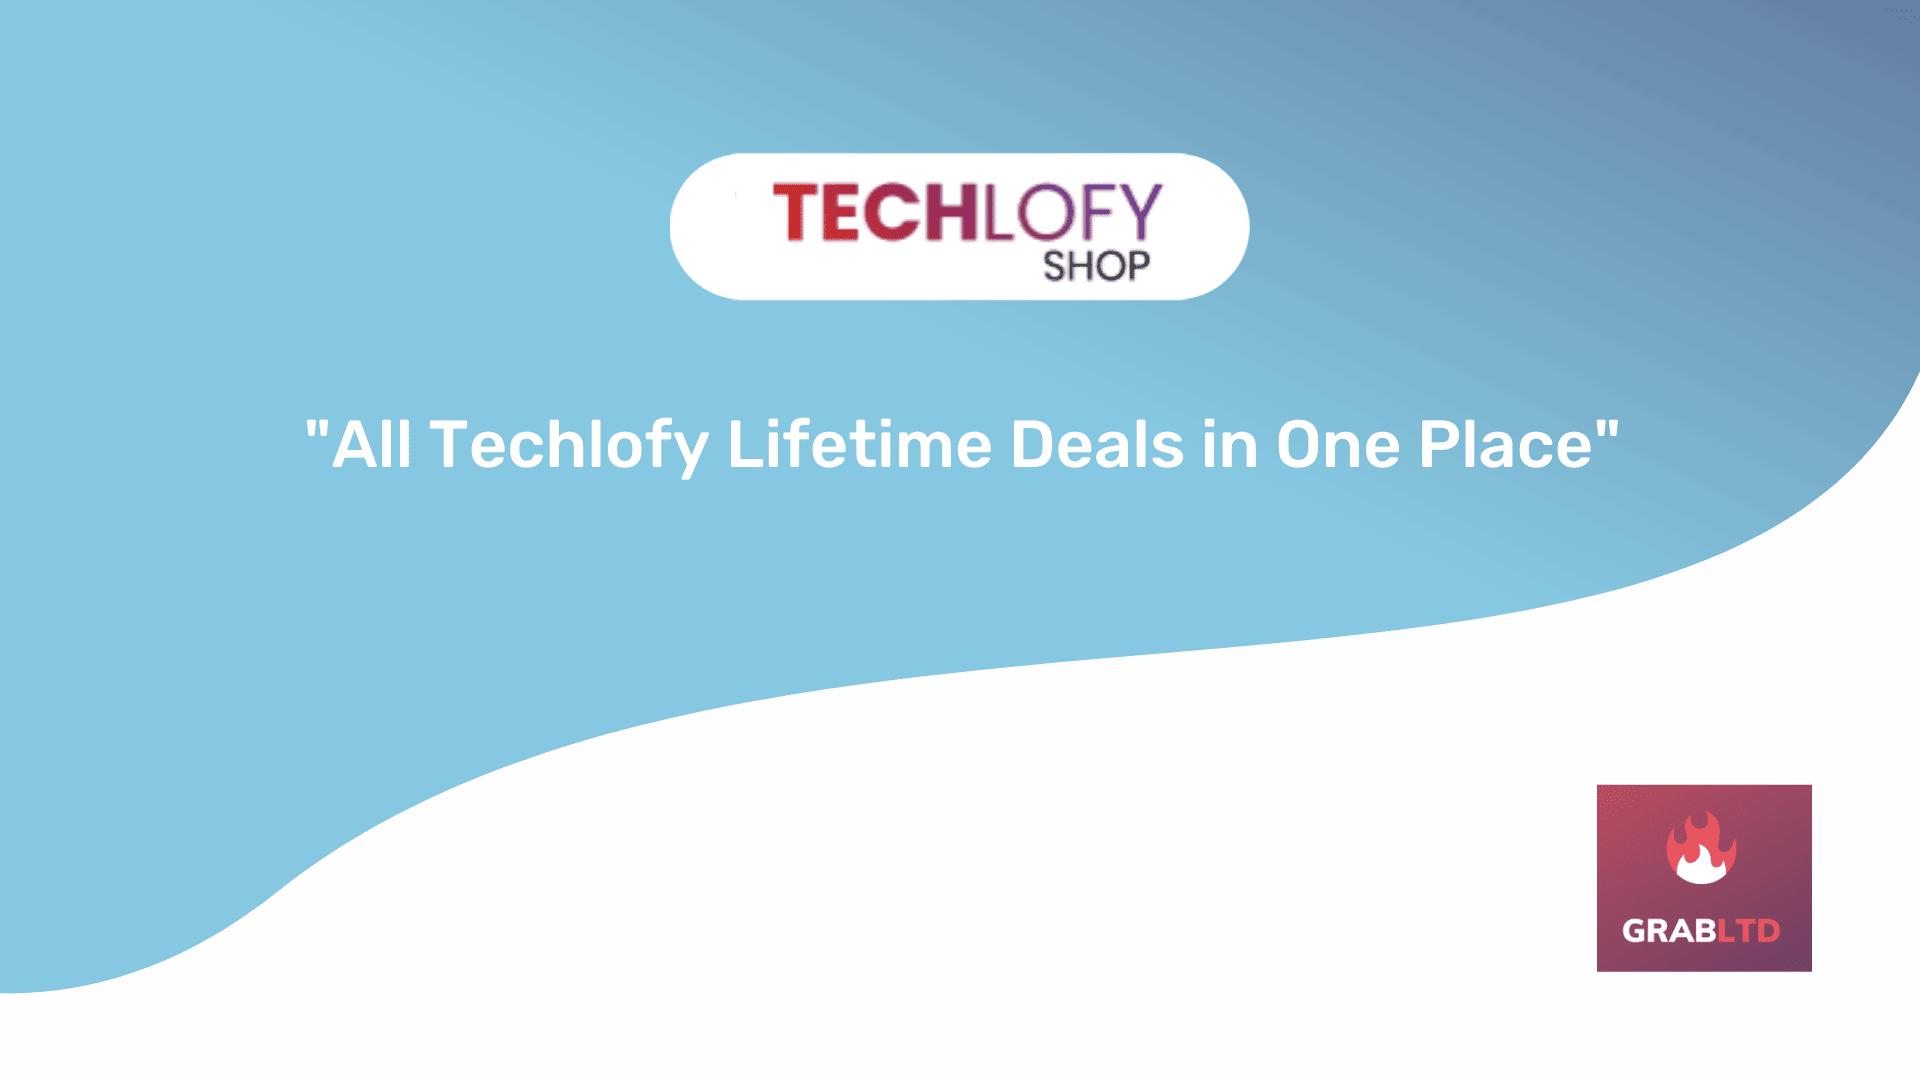 techlofy-lifetime-deals-grabltd